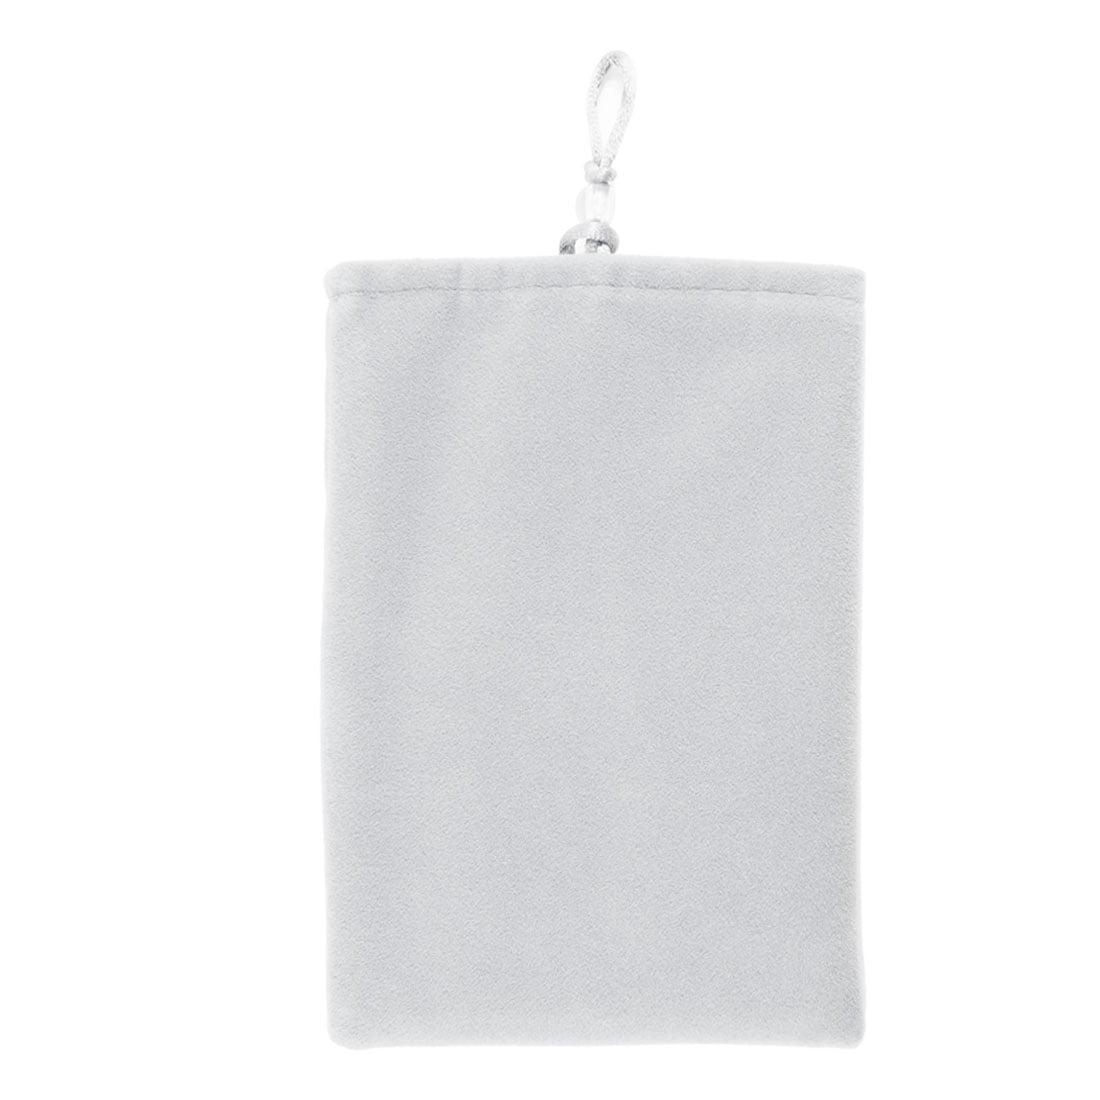 Unique Bargains Portable Light Gray Velvet Pouch Sleeve Bag Case 5 Inch for Mobile Phone MP4 MP5